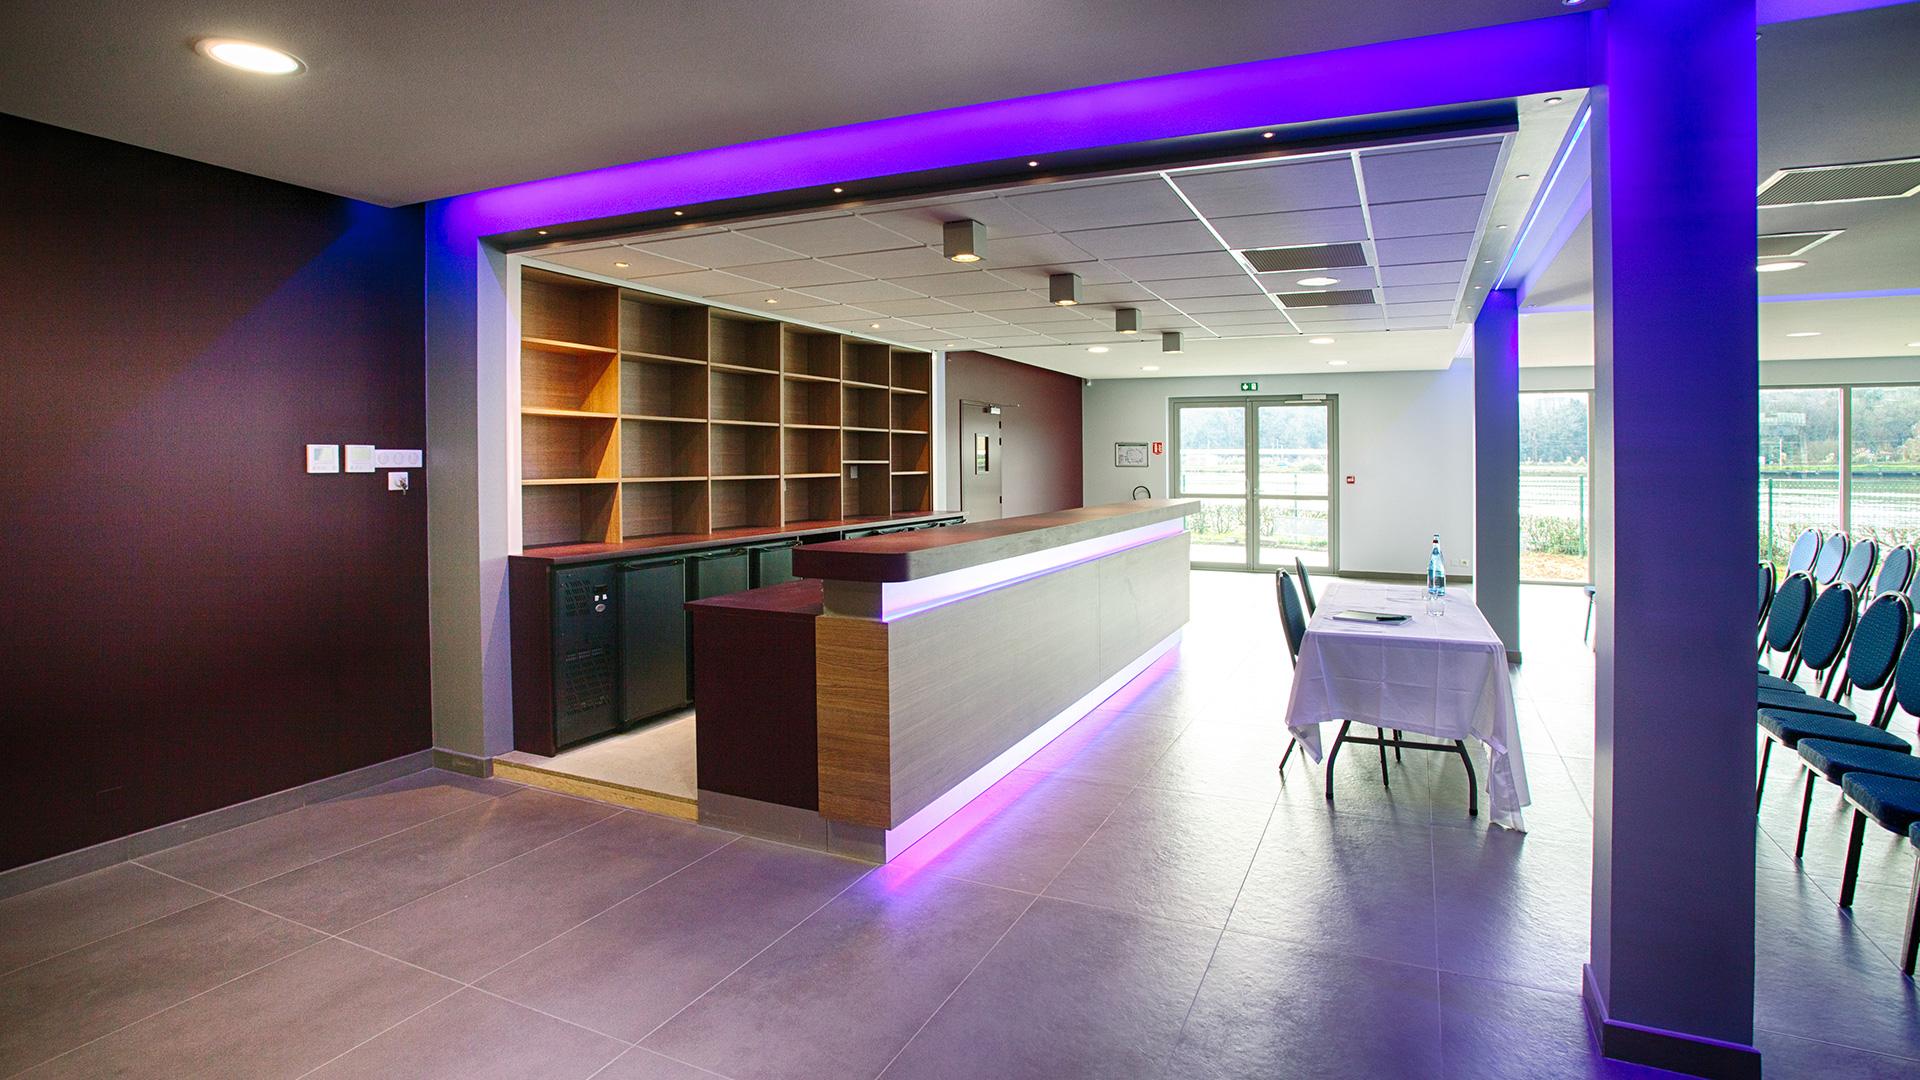 s minaires bayonne pays basque. Black Bedroom Furniture Sets. Home Design Ideas